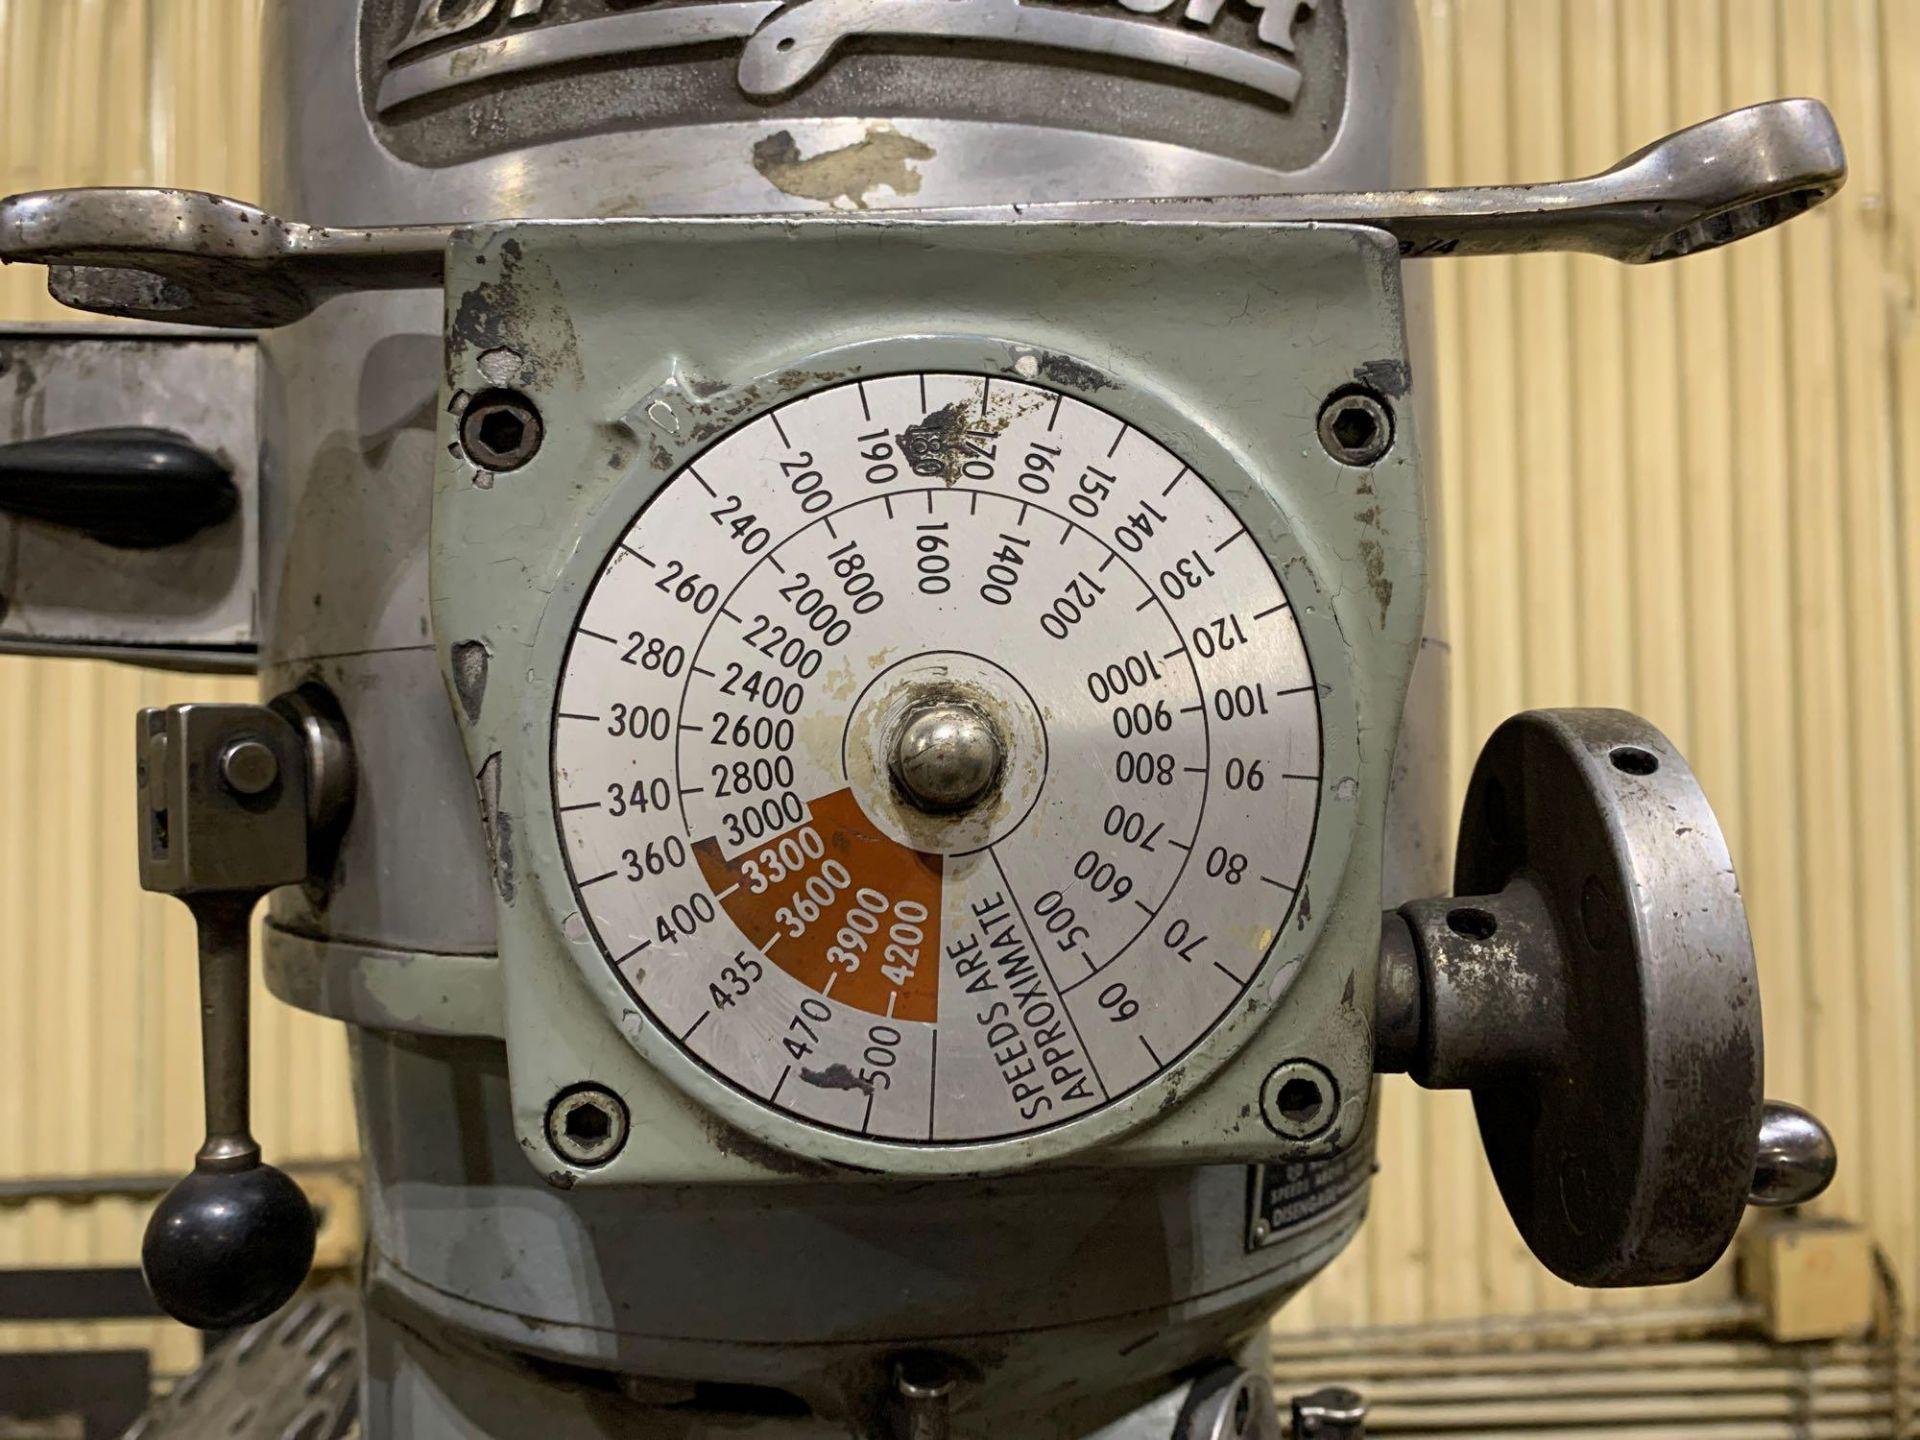 "Bridgeport 2J Vertical Milling Machine Variable Speed Head S/N 132833 CAPACITIES Table size: 9"" X 42 - Image 9 of 12"